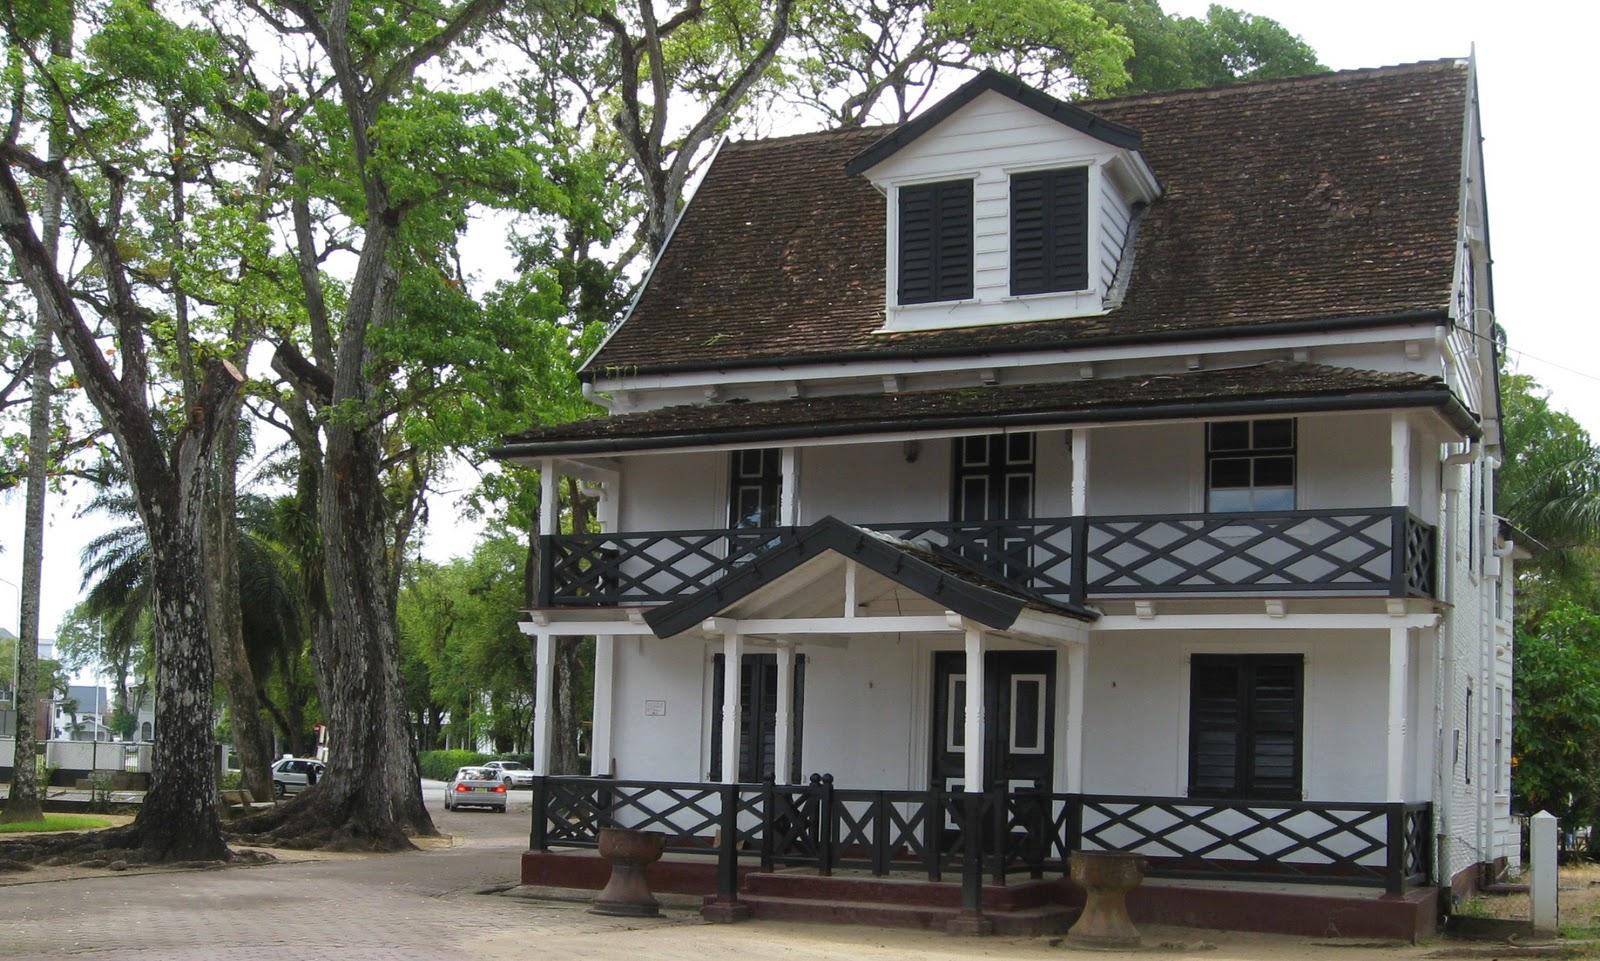 dutch colonial architecture paramaribo adventurers novel slavery west